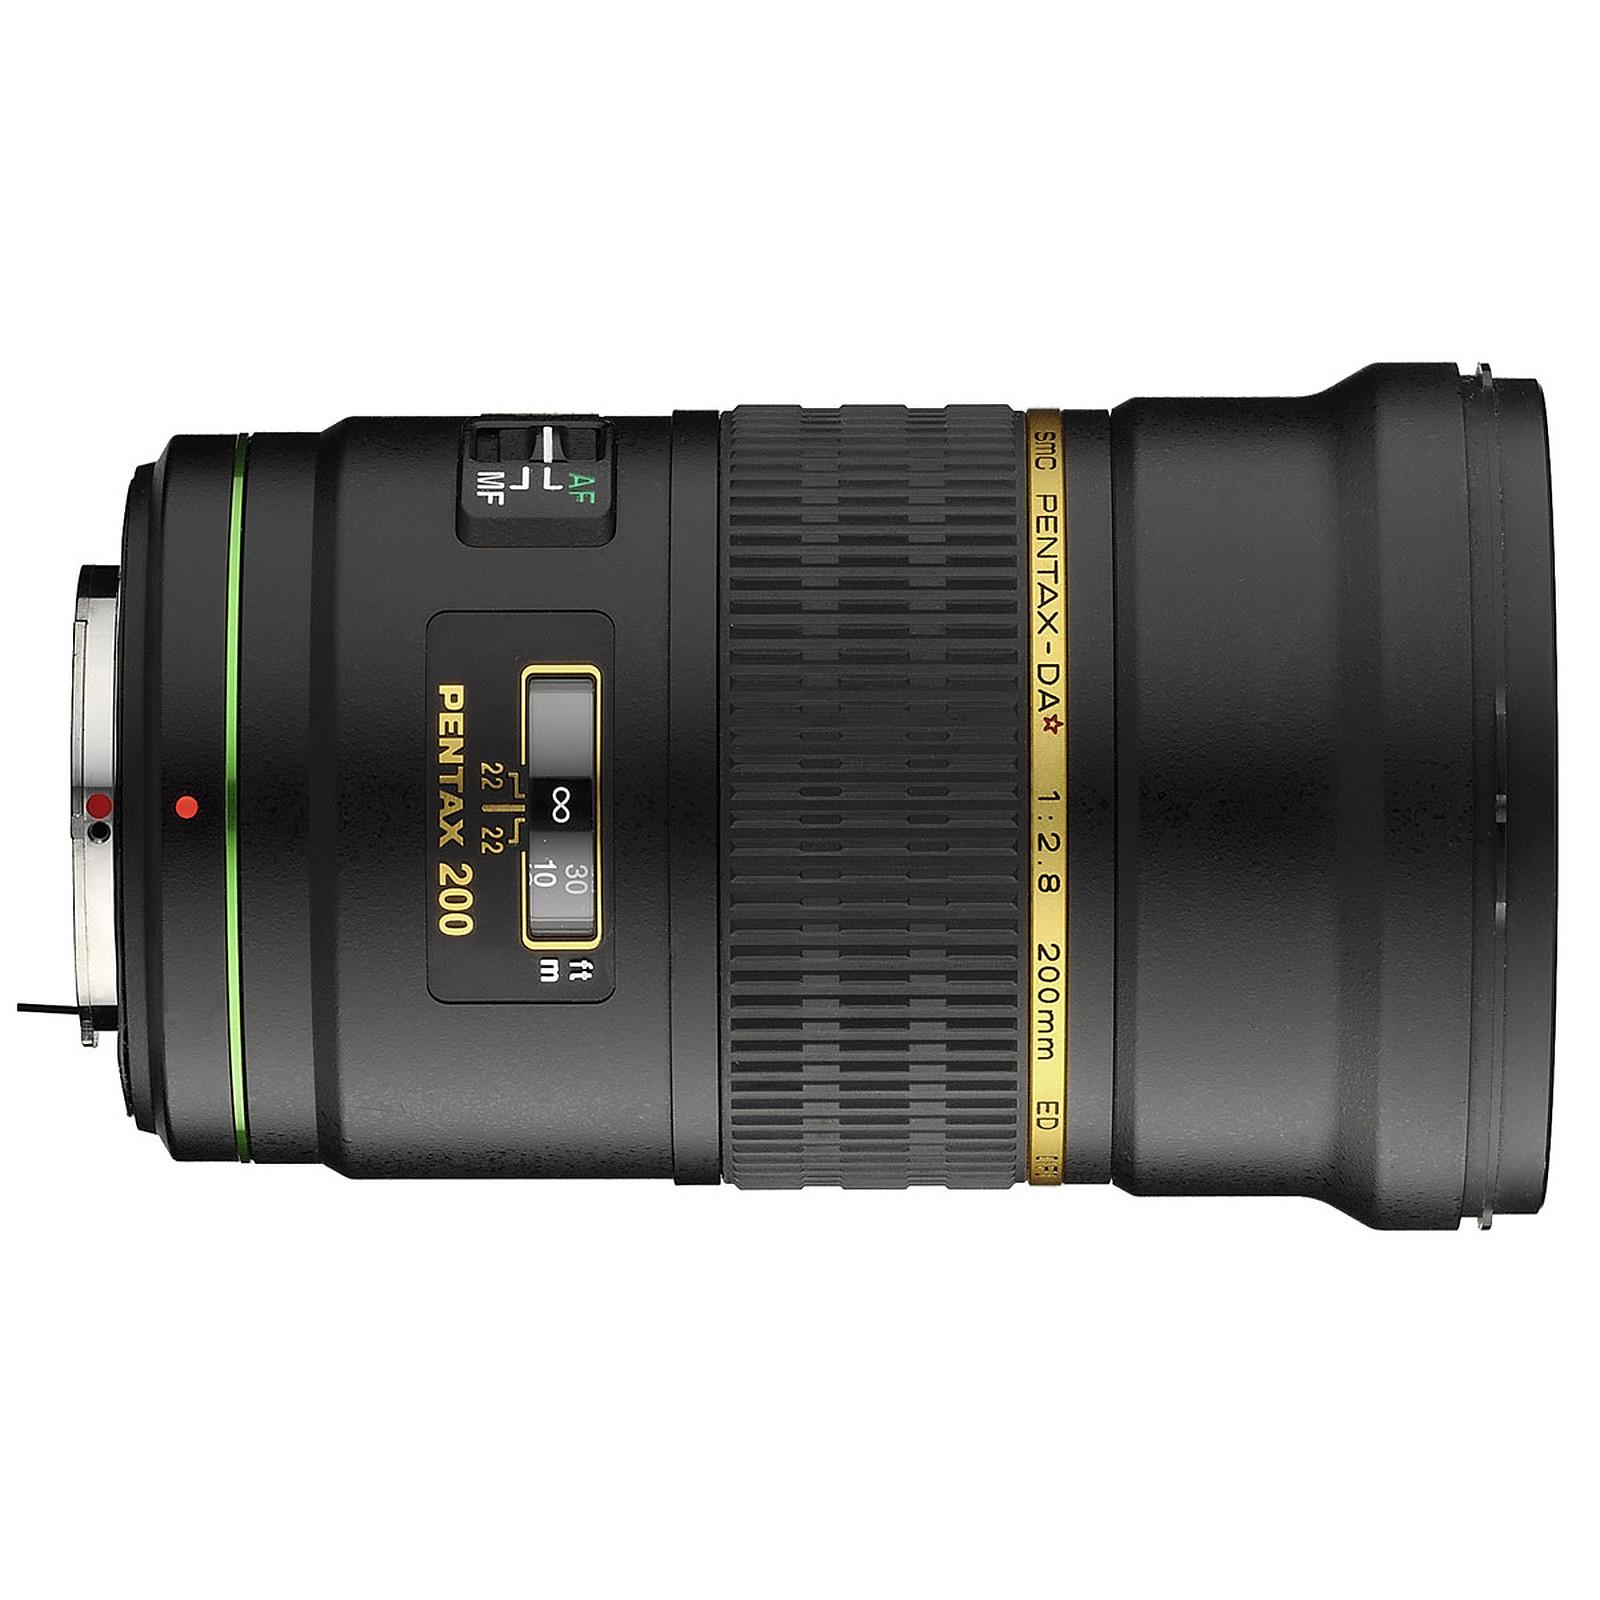 Pentax smc DA 200mm f/2.8 ED [IF] SDM